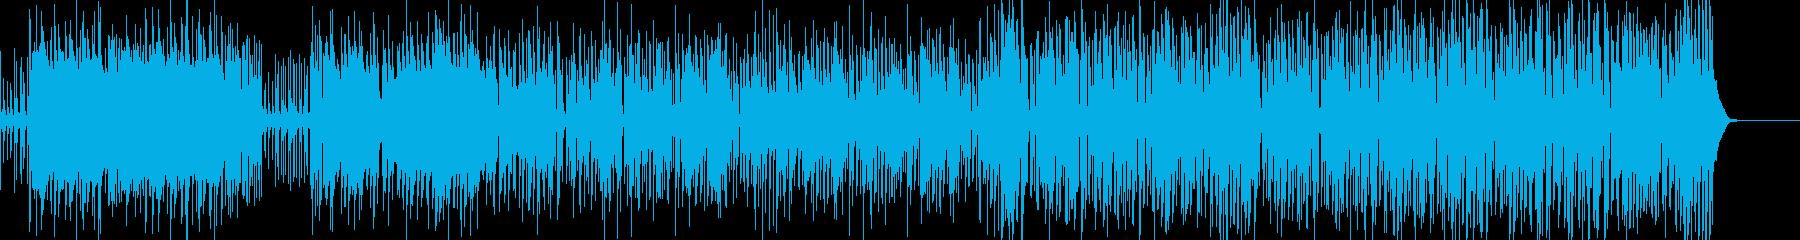 CM軽快なリズムやみつきジャズスタイル♪の再生済みの波形